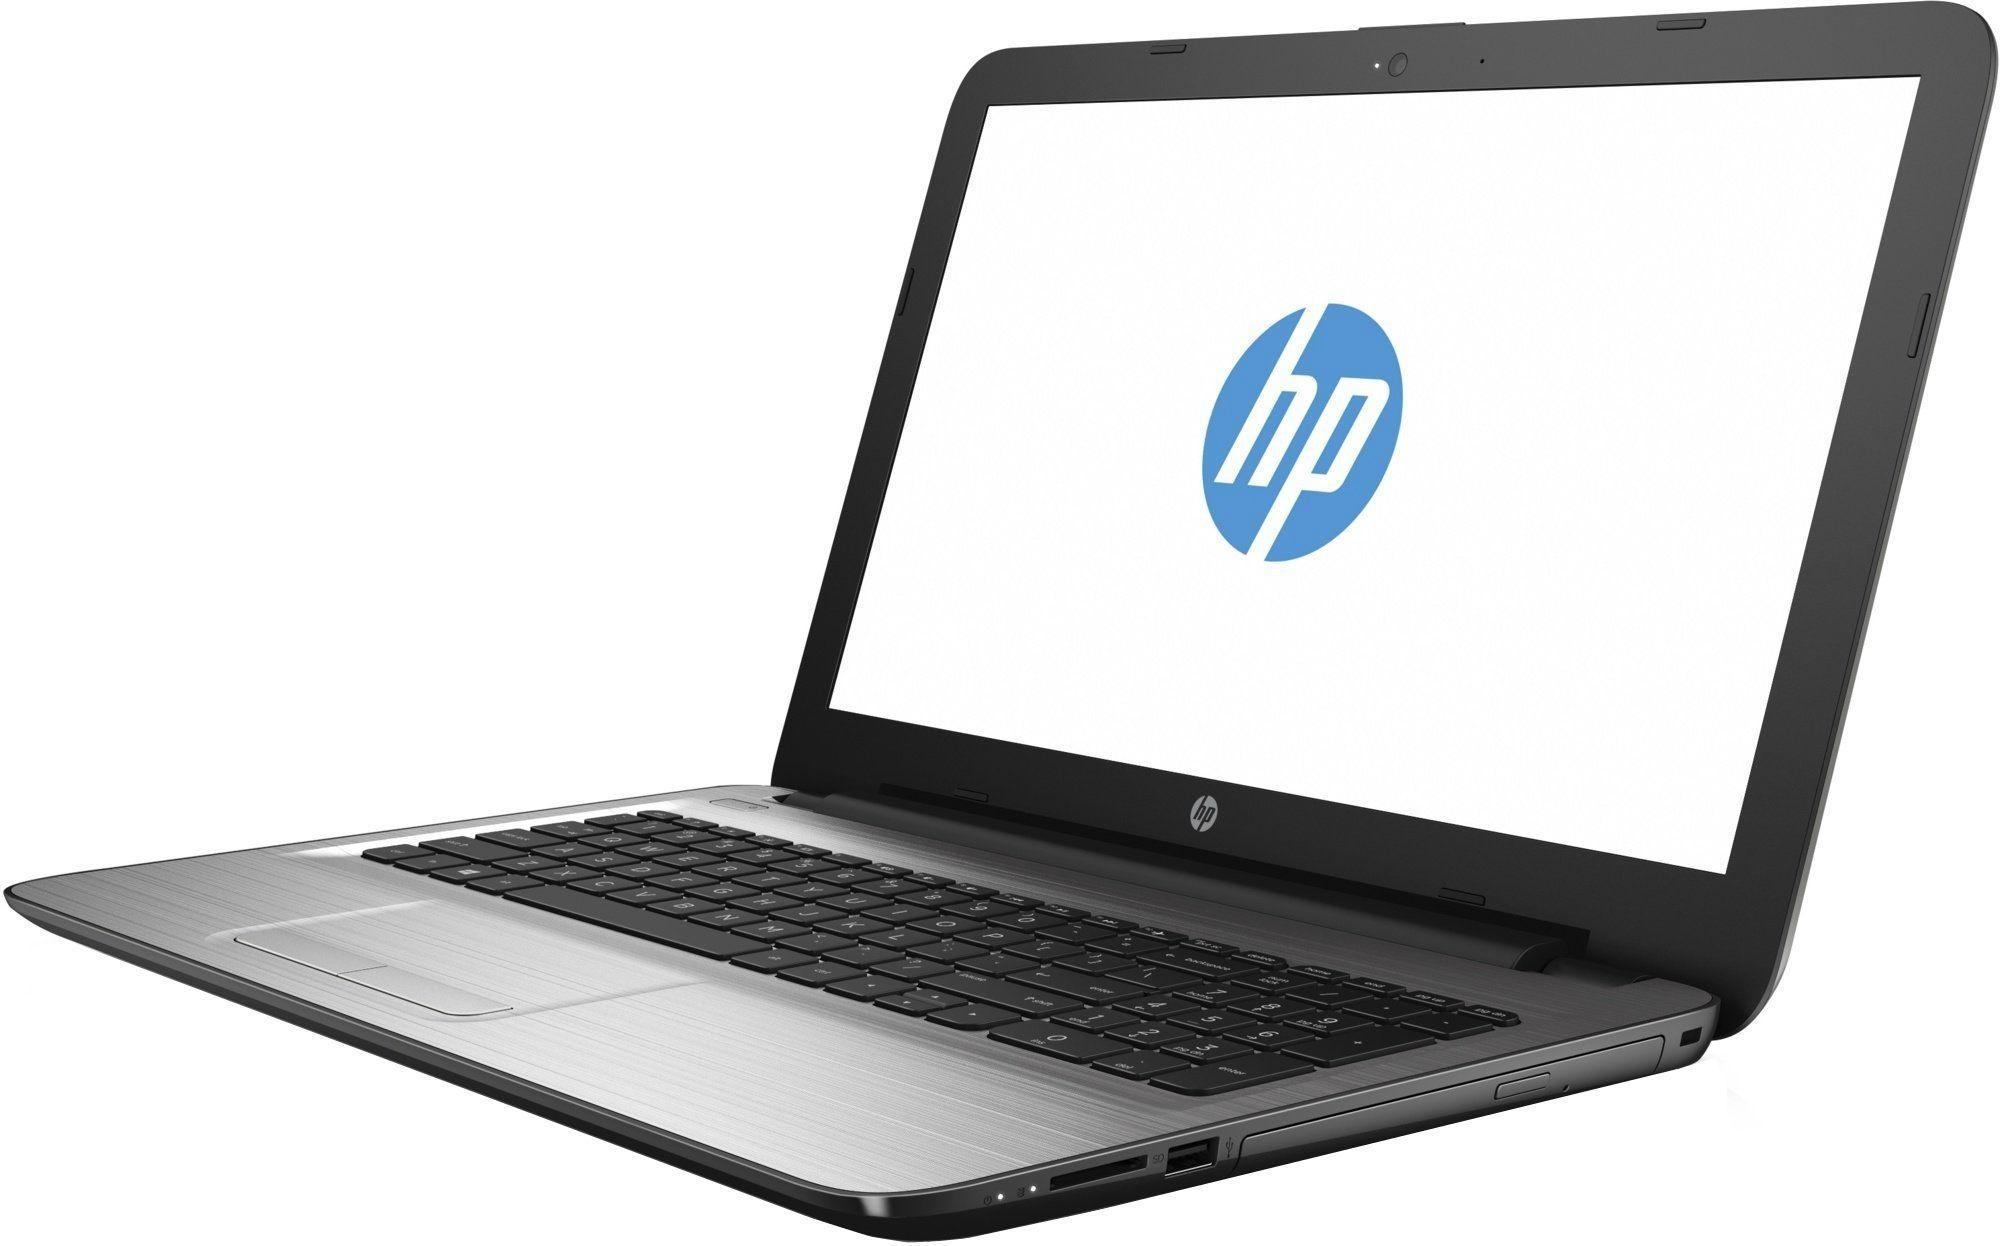 Купить Ноутбук HP Pavilion 15-cc004ur (1ZA88EA) фото 2